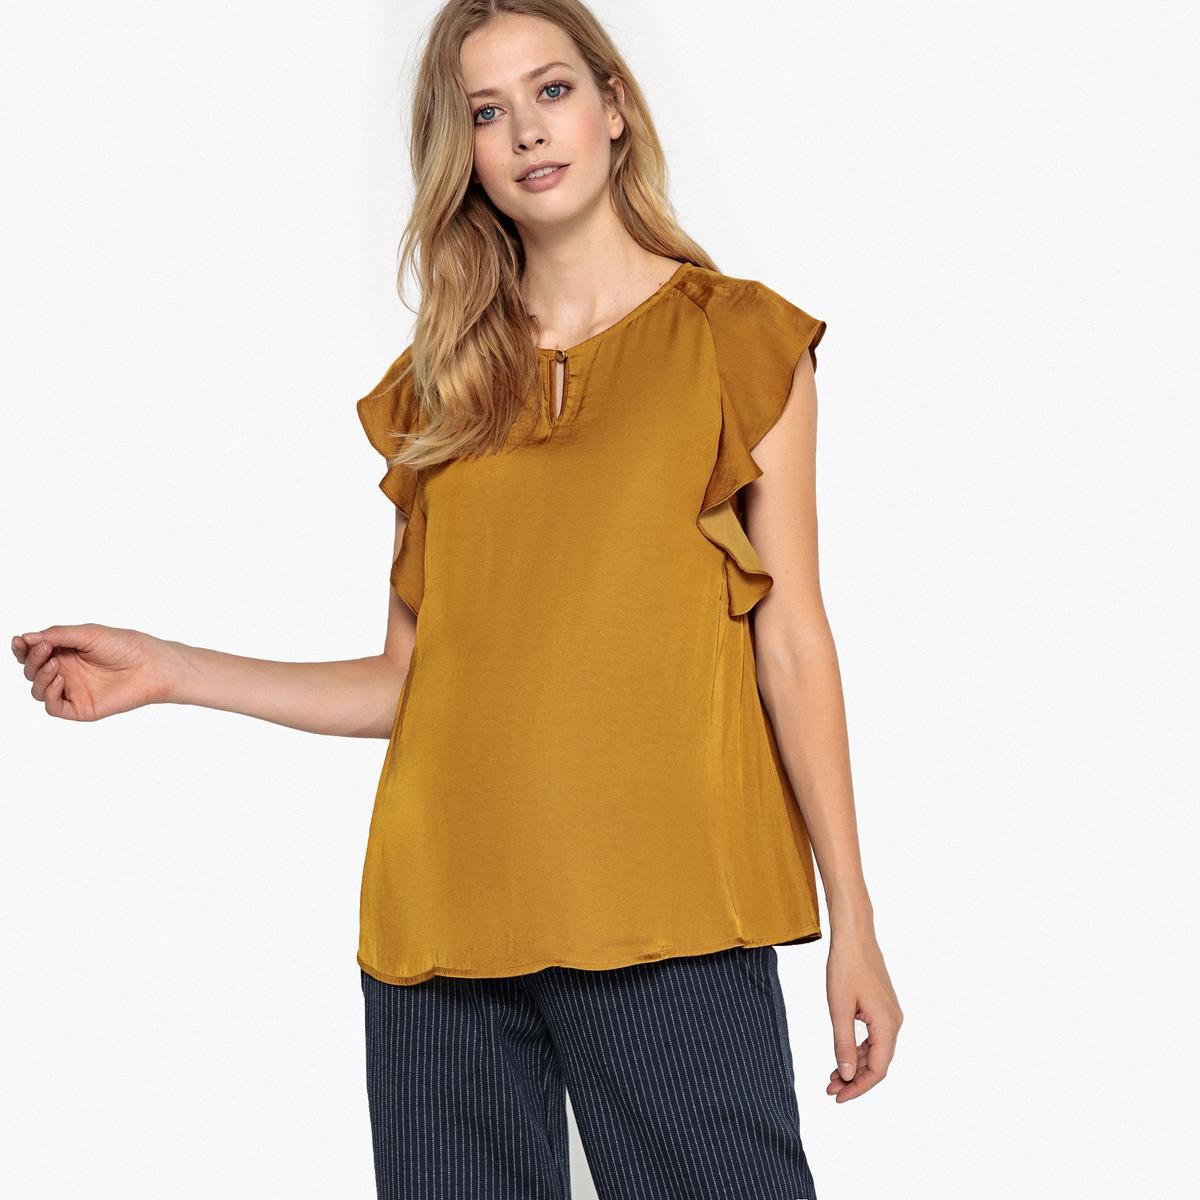 Блуза с рукавами с воланами для периода беременности от LA REDOUTE MATERNITE